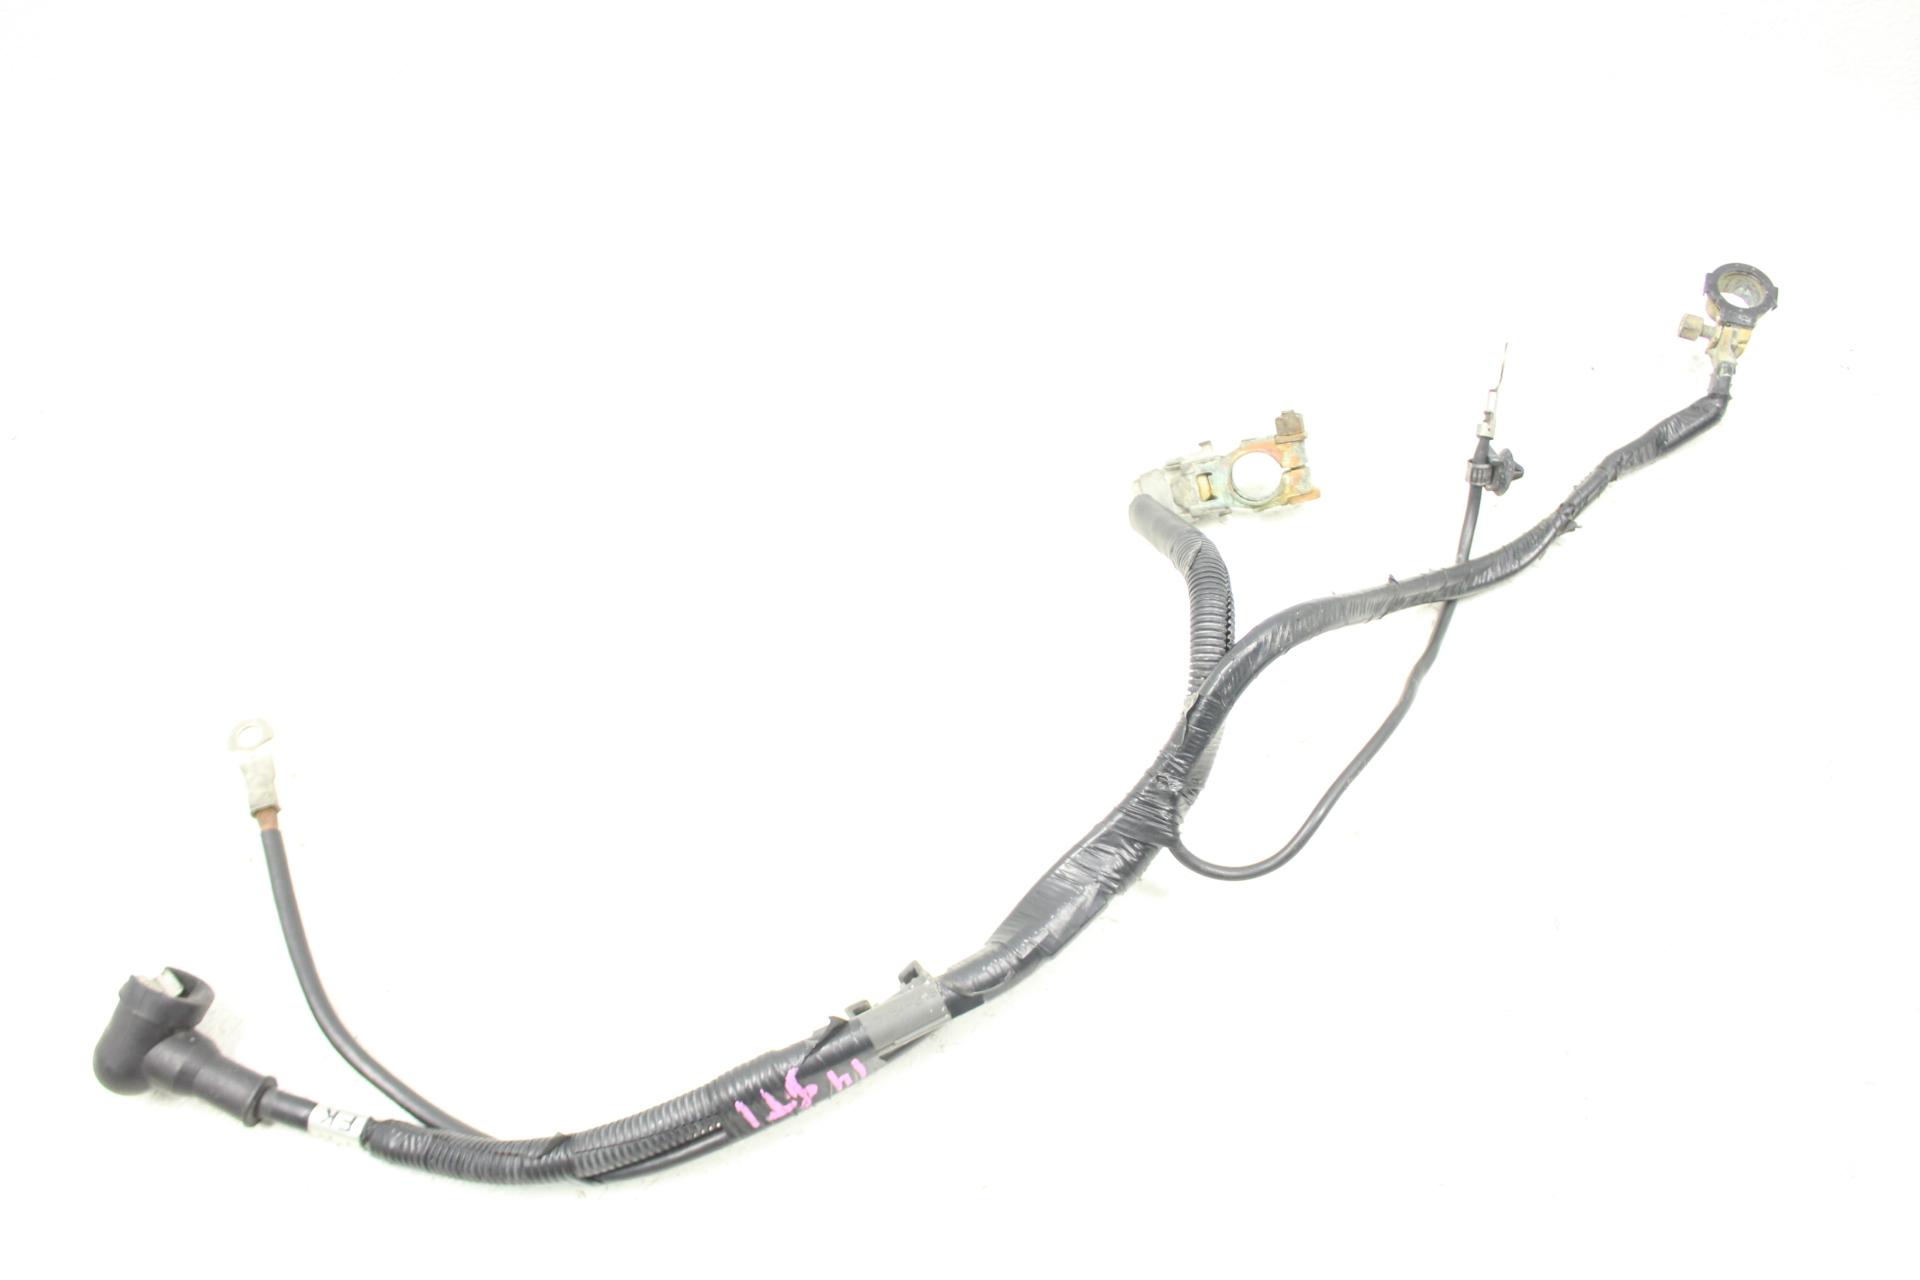 Subaru Impreza Wrx Amp Sti Battery Wiring Harness